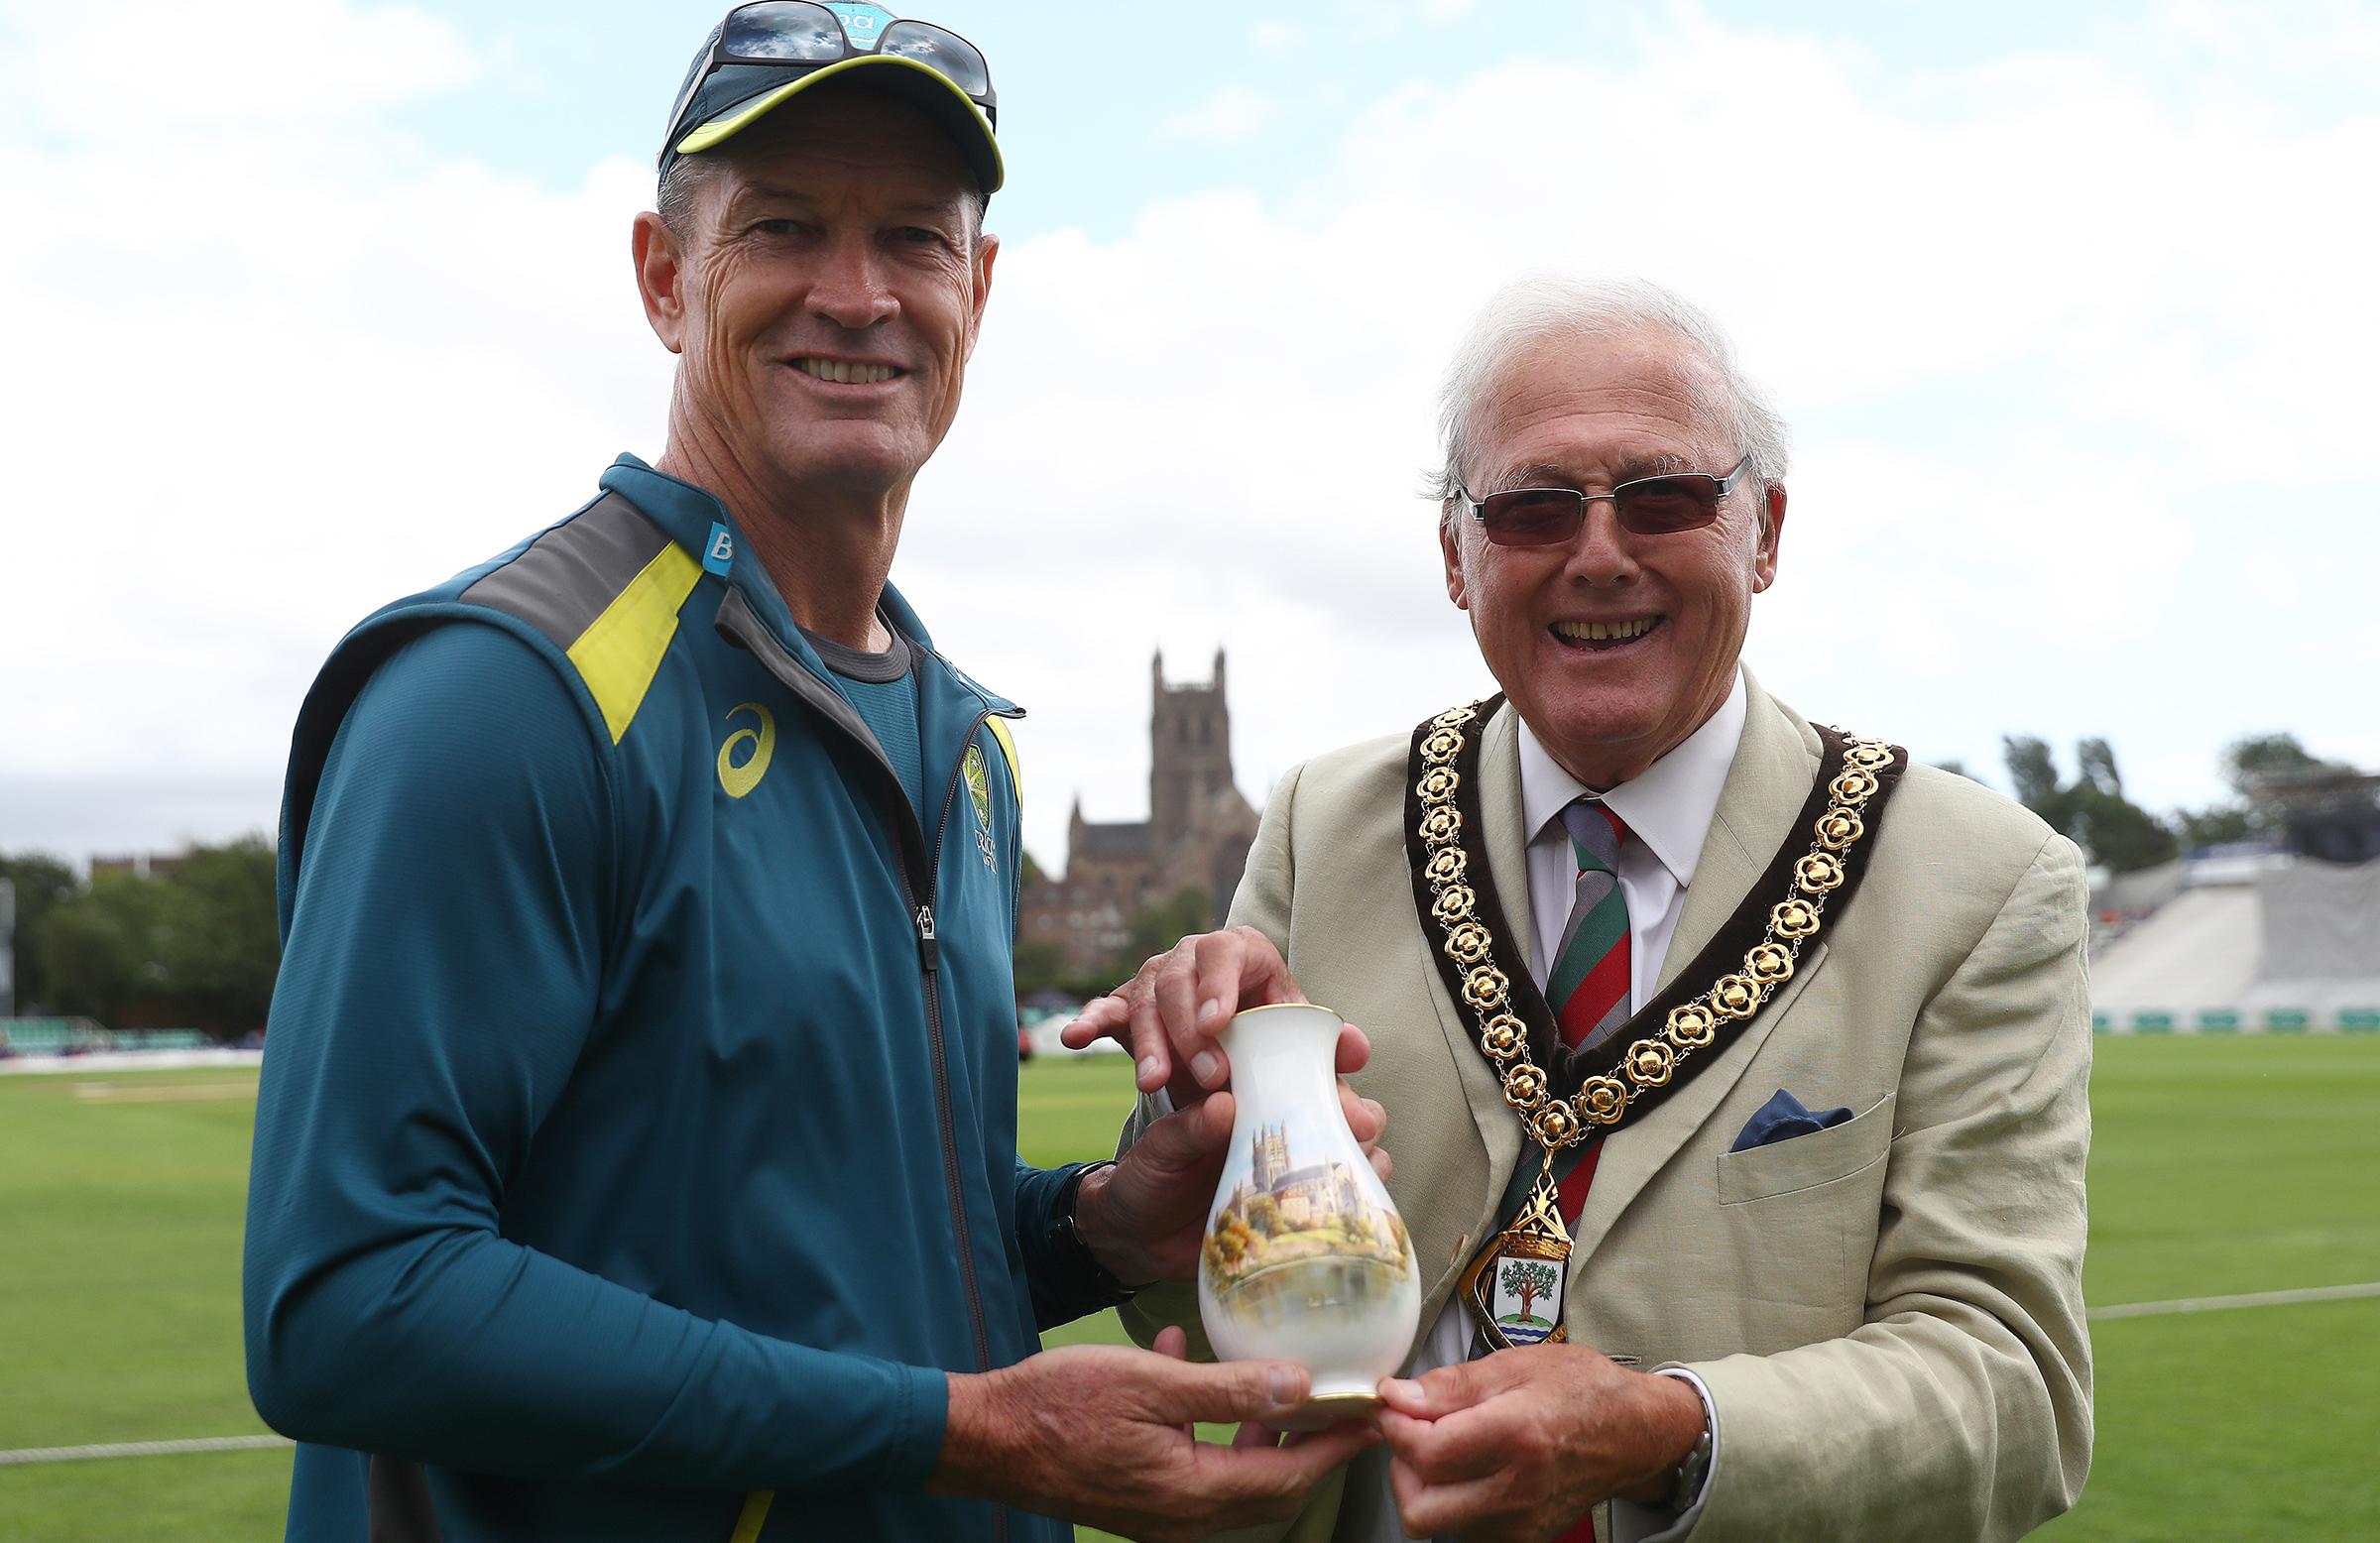 Graeme Hick accepts the porcelain vase commemorating Sir Donald Bradman // Getty